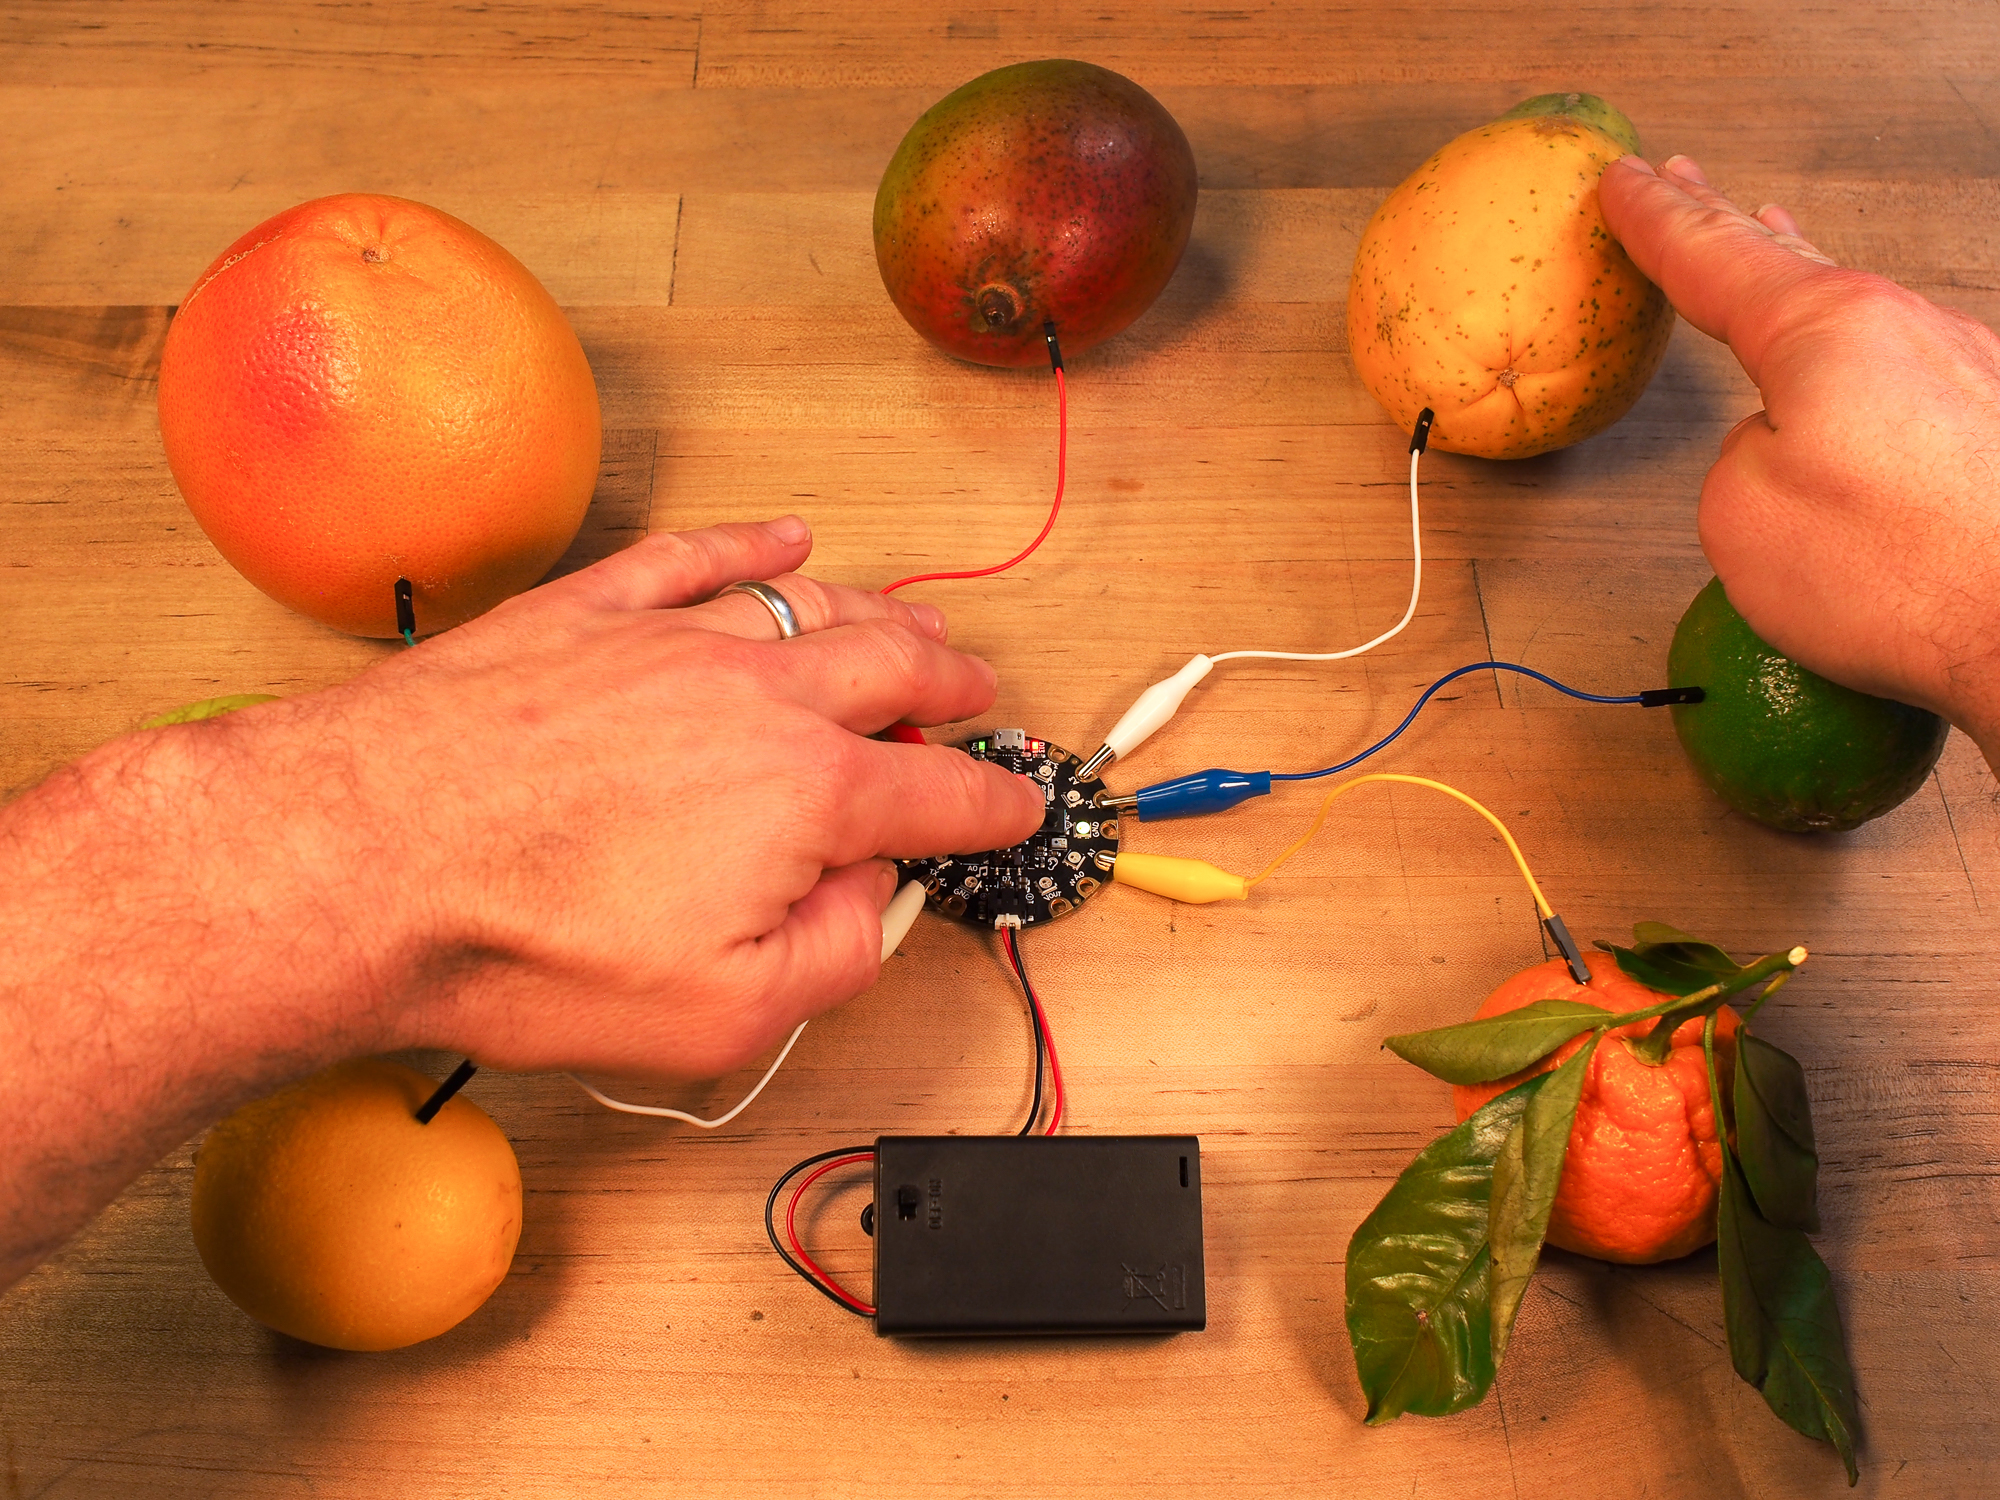 circuitpython_PC090538_2k.jpg